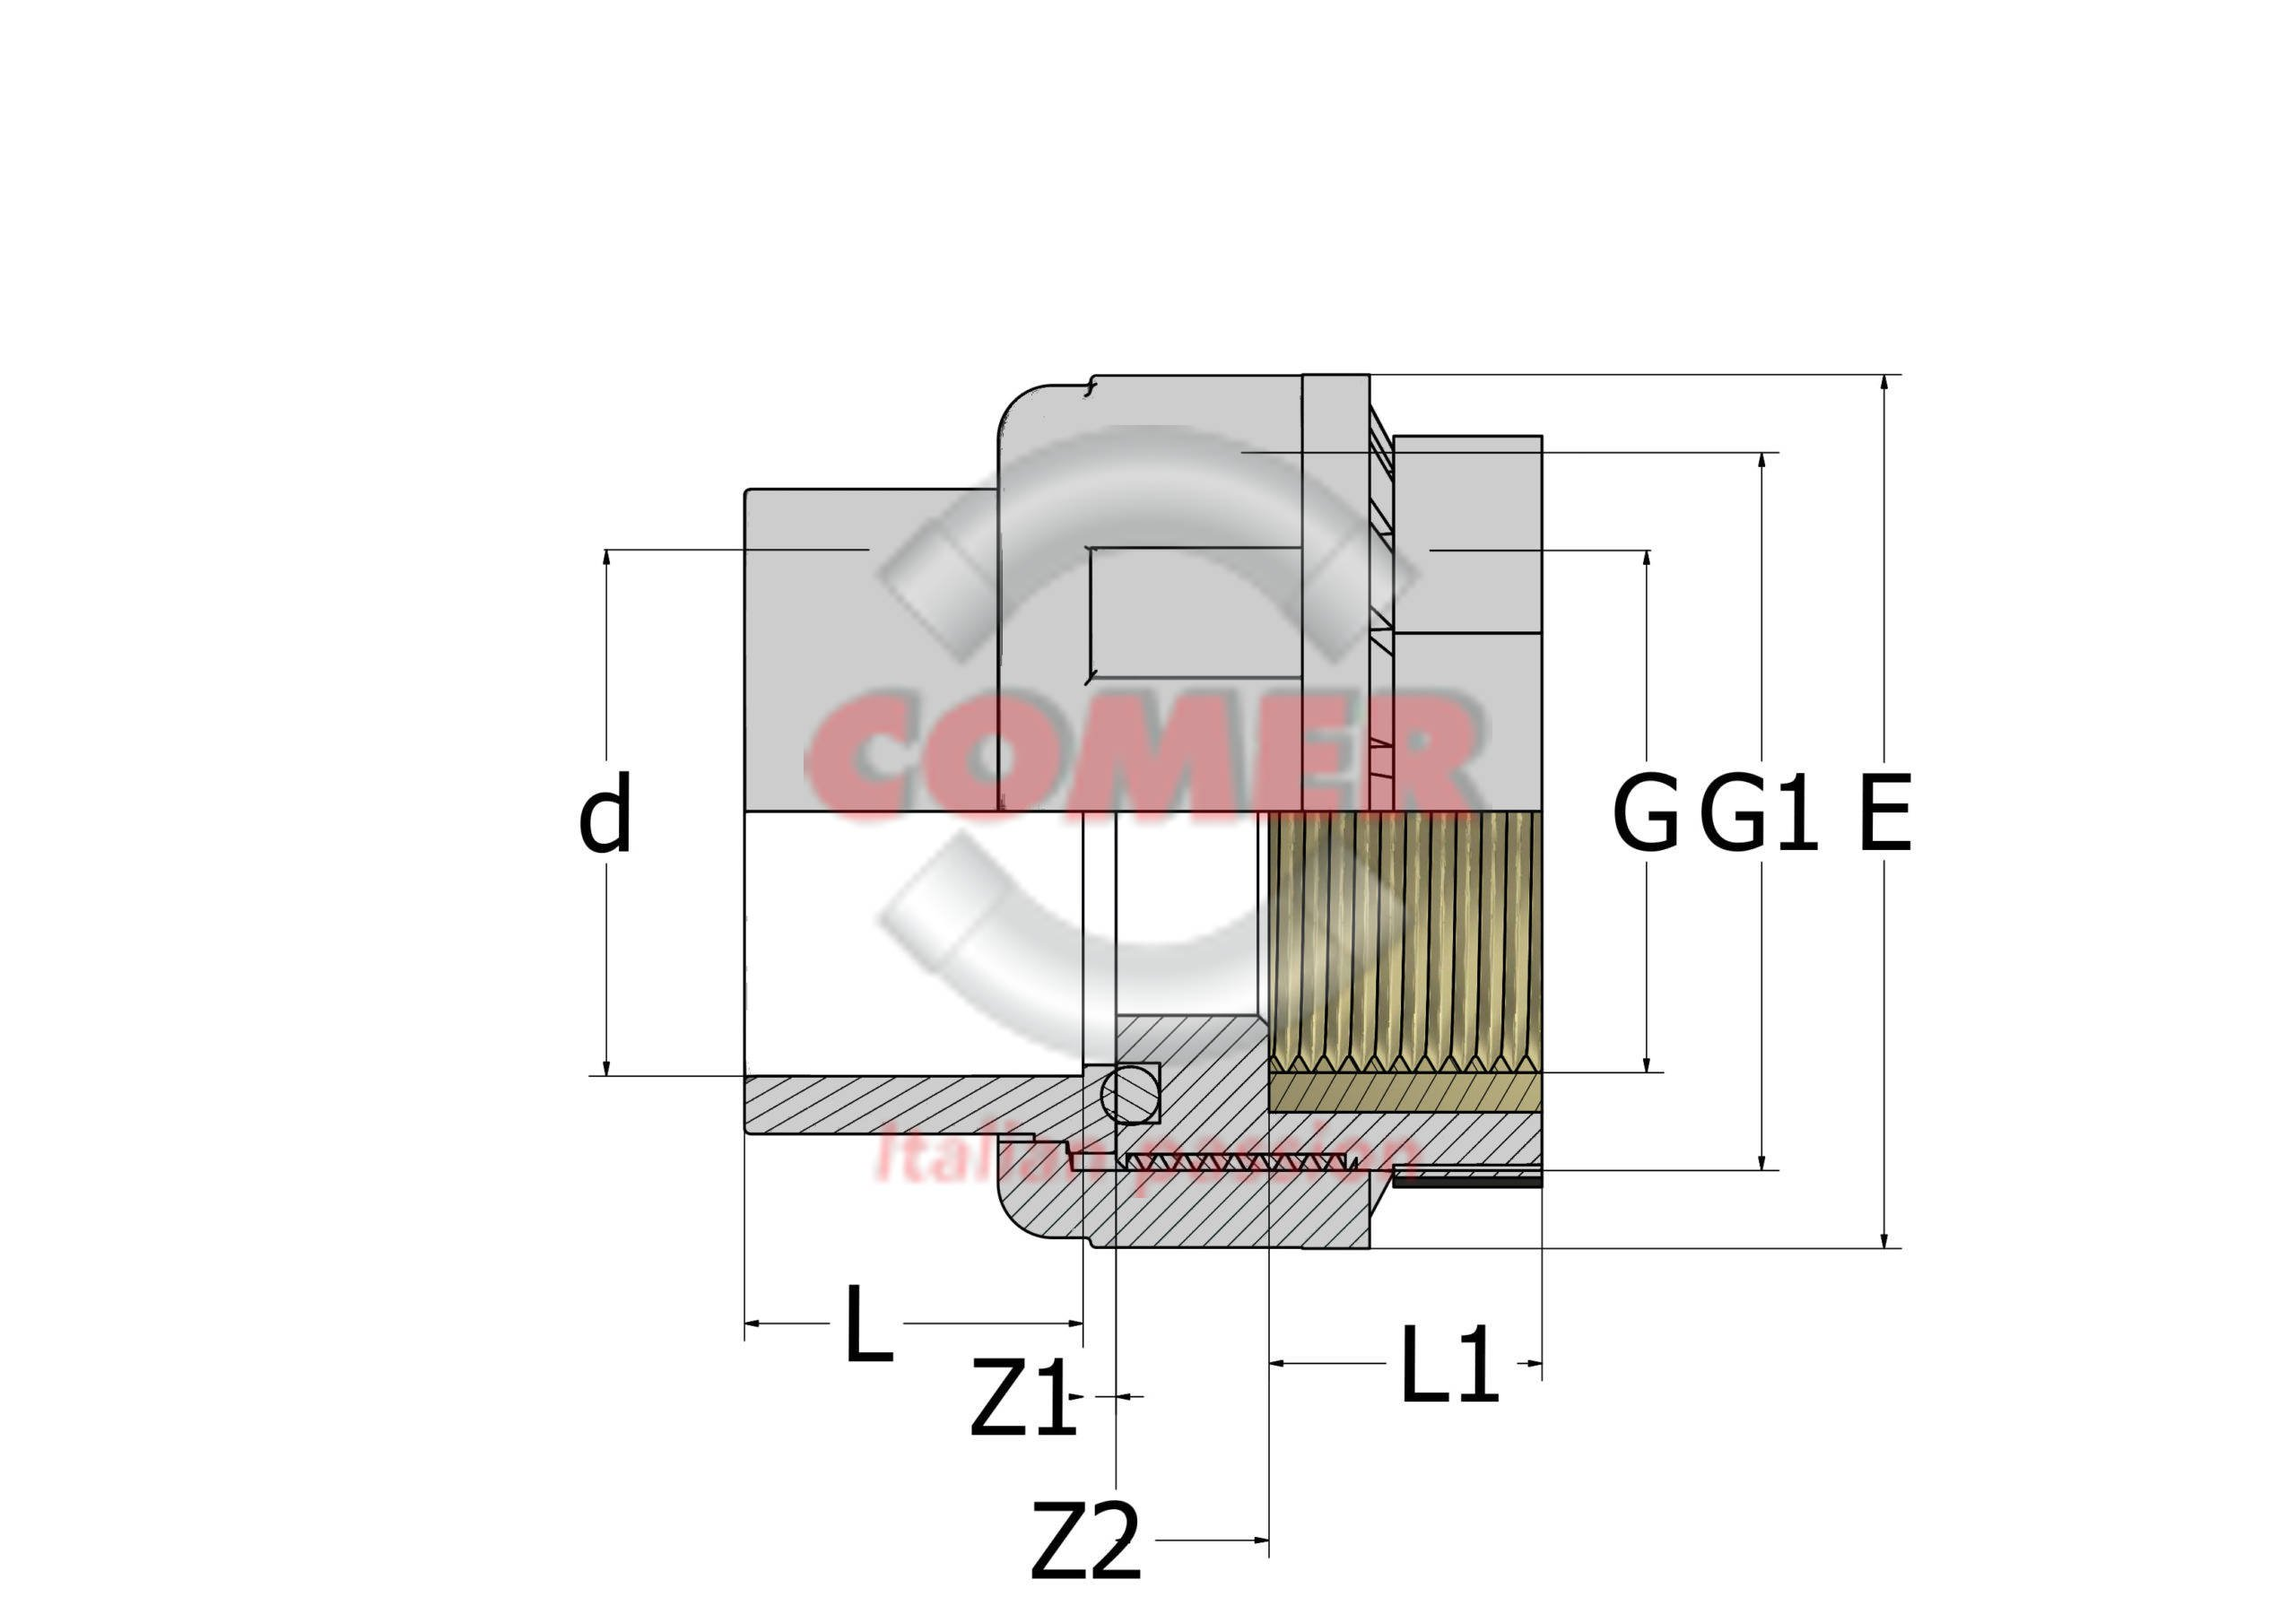 C-UN72 - Union with O-ring female plain/brass insert female threaded in C-PVC